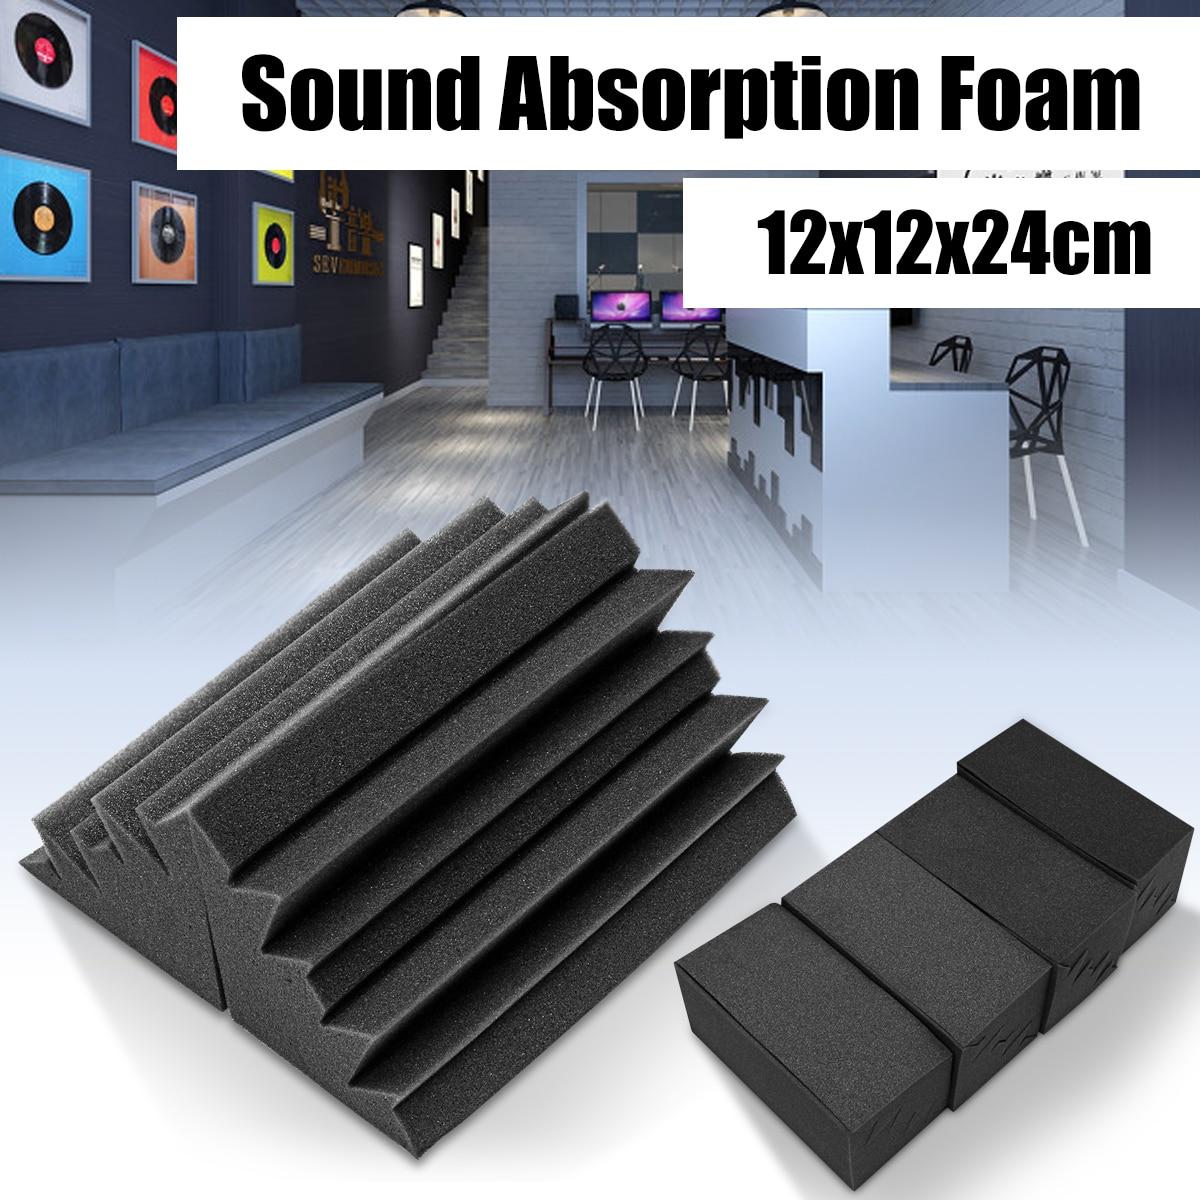 8Pcs 12x11x24cm Soundproofing Foam Acoustic Foam Noise Sound Treatment Studio Room Absorption Wedge Tiles Polyurethane foam 12x soundproofing foam acoustic absording treatment foams home wall car wedge tiles studio foam ktv studio noise sponge foam us